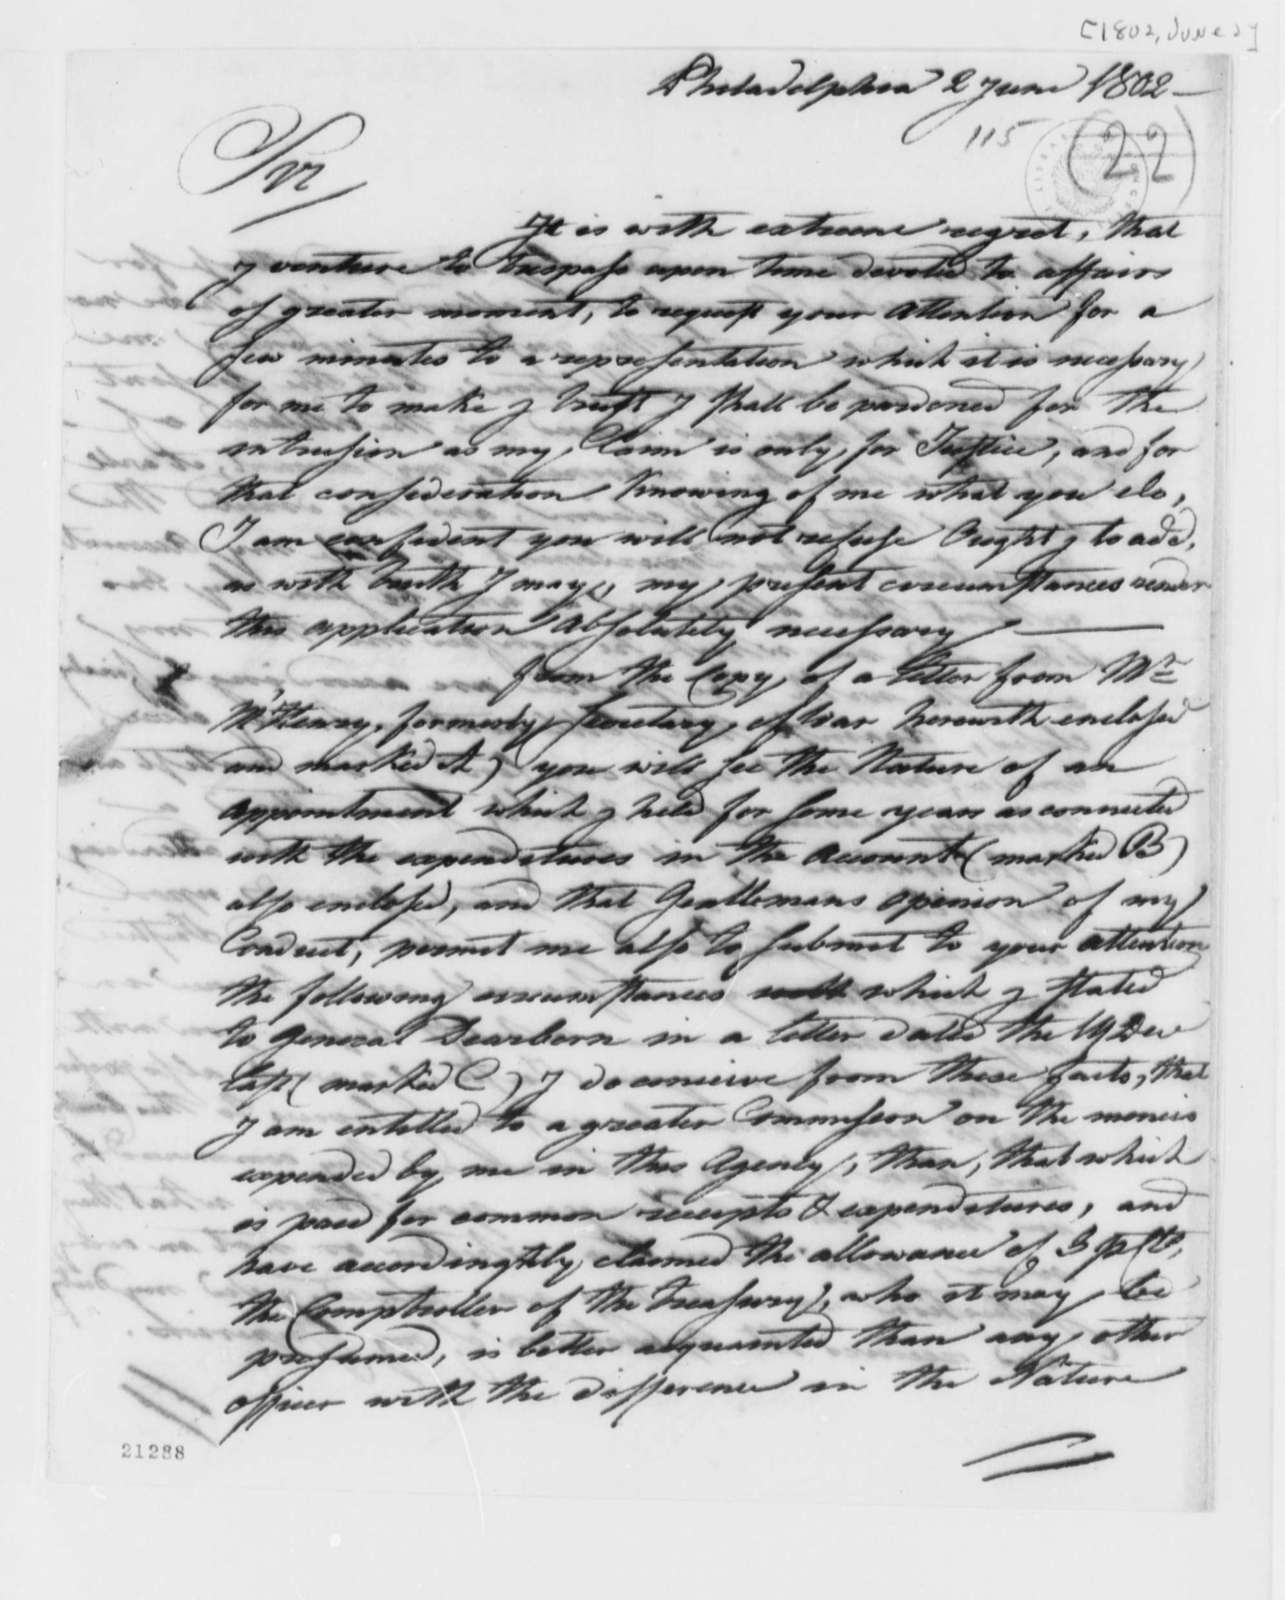 Francis Mentges to Thomas Jefferson, June 2, 1802